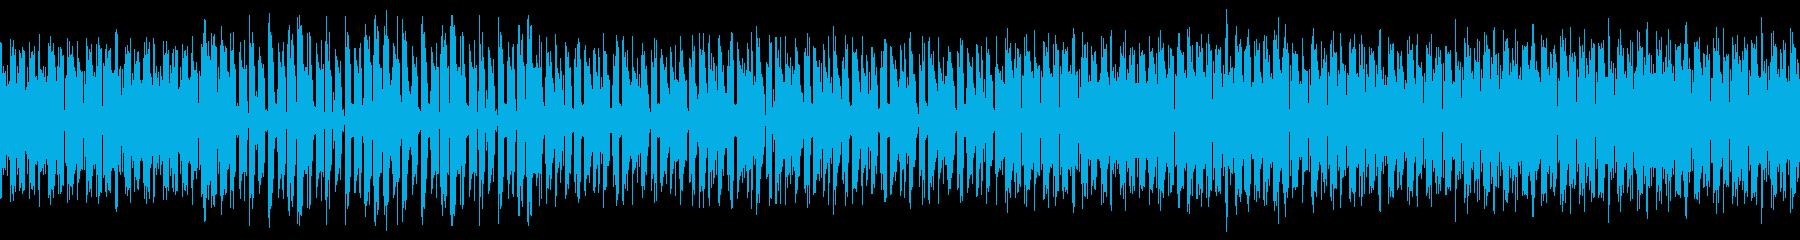 LIVEオープニング Houseの再生済みの波形